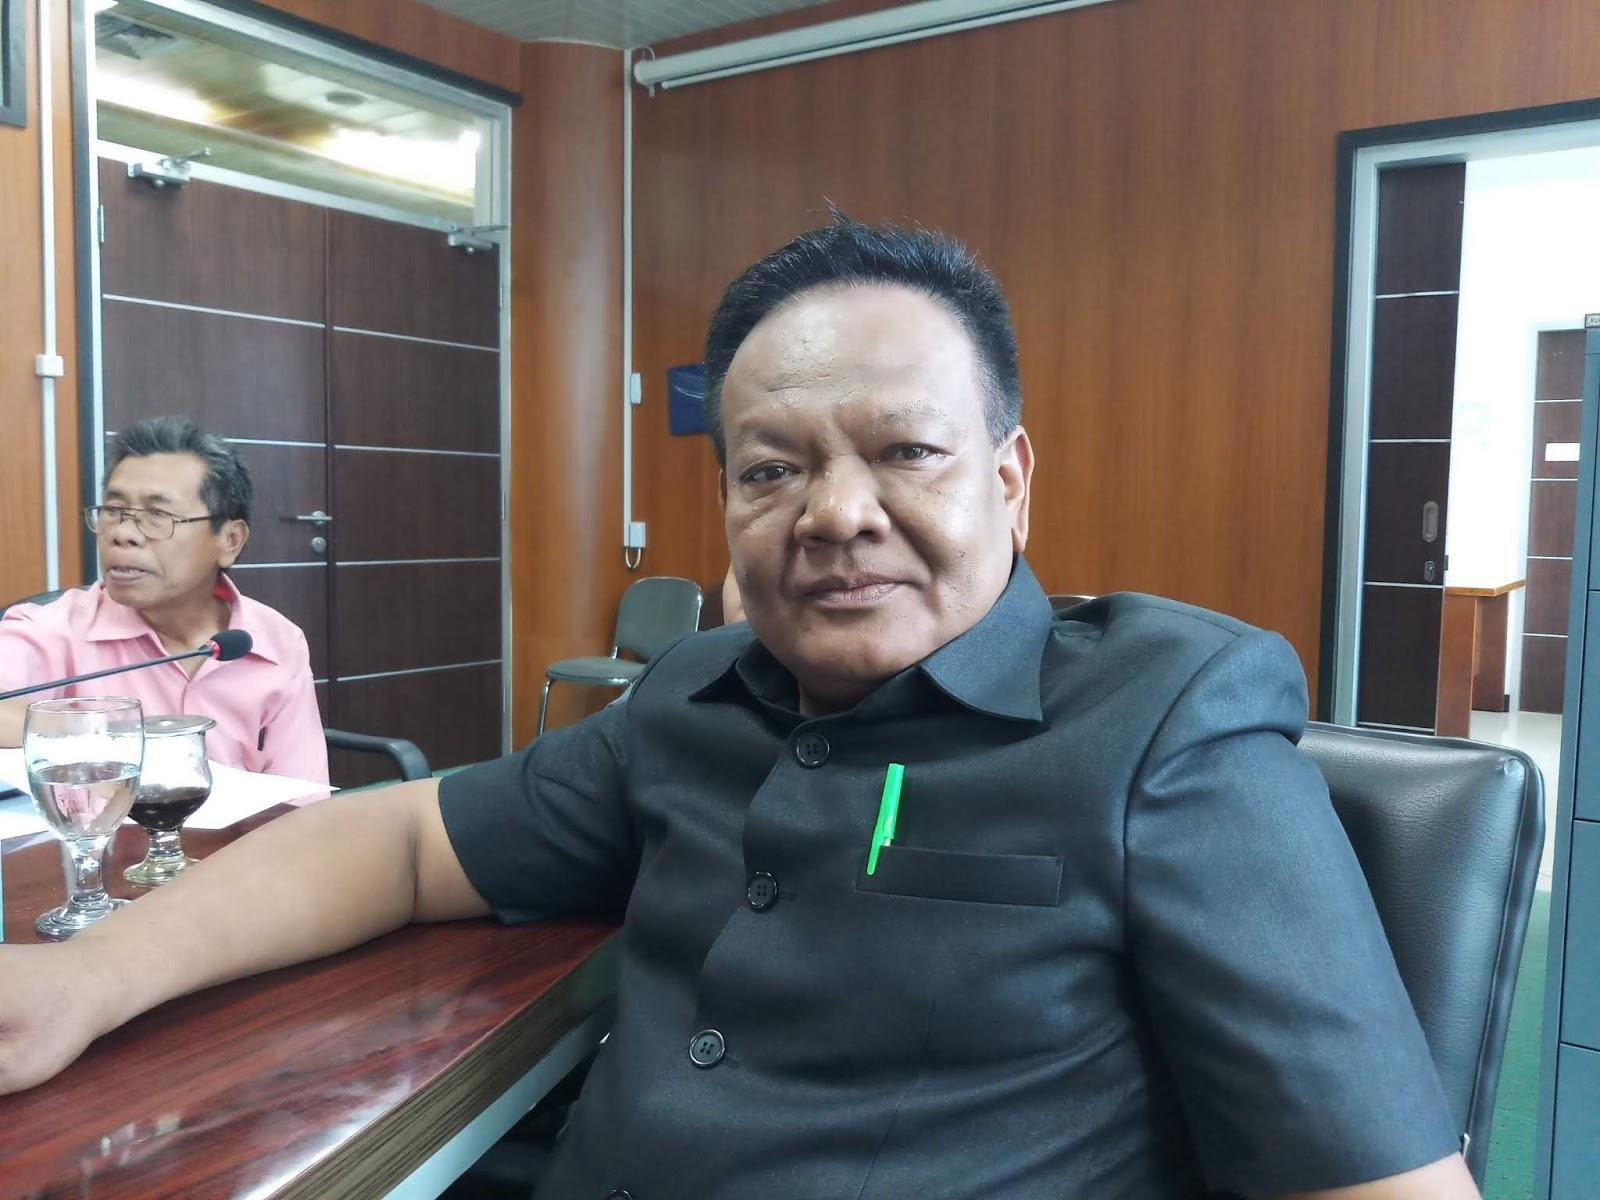 Masyarakat Bangga Punya Sosok Wali Kota Pemberani